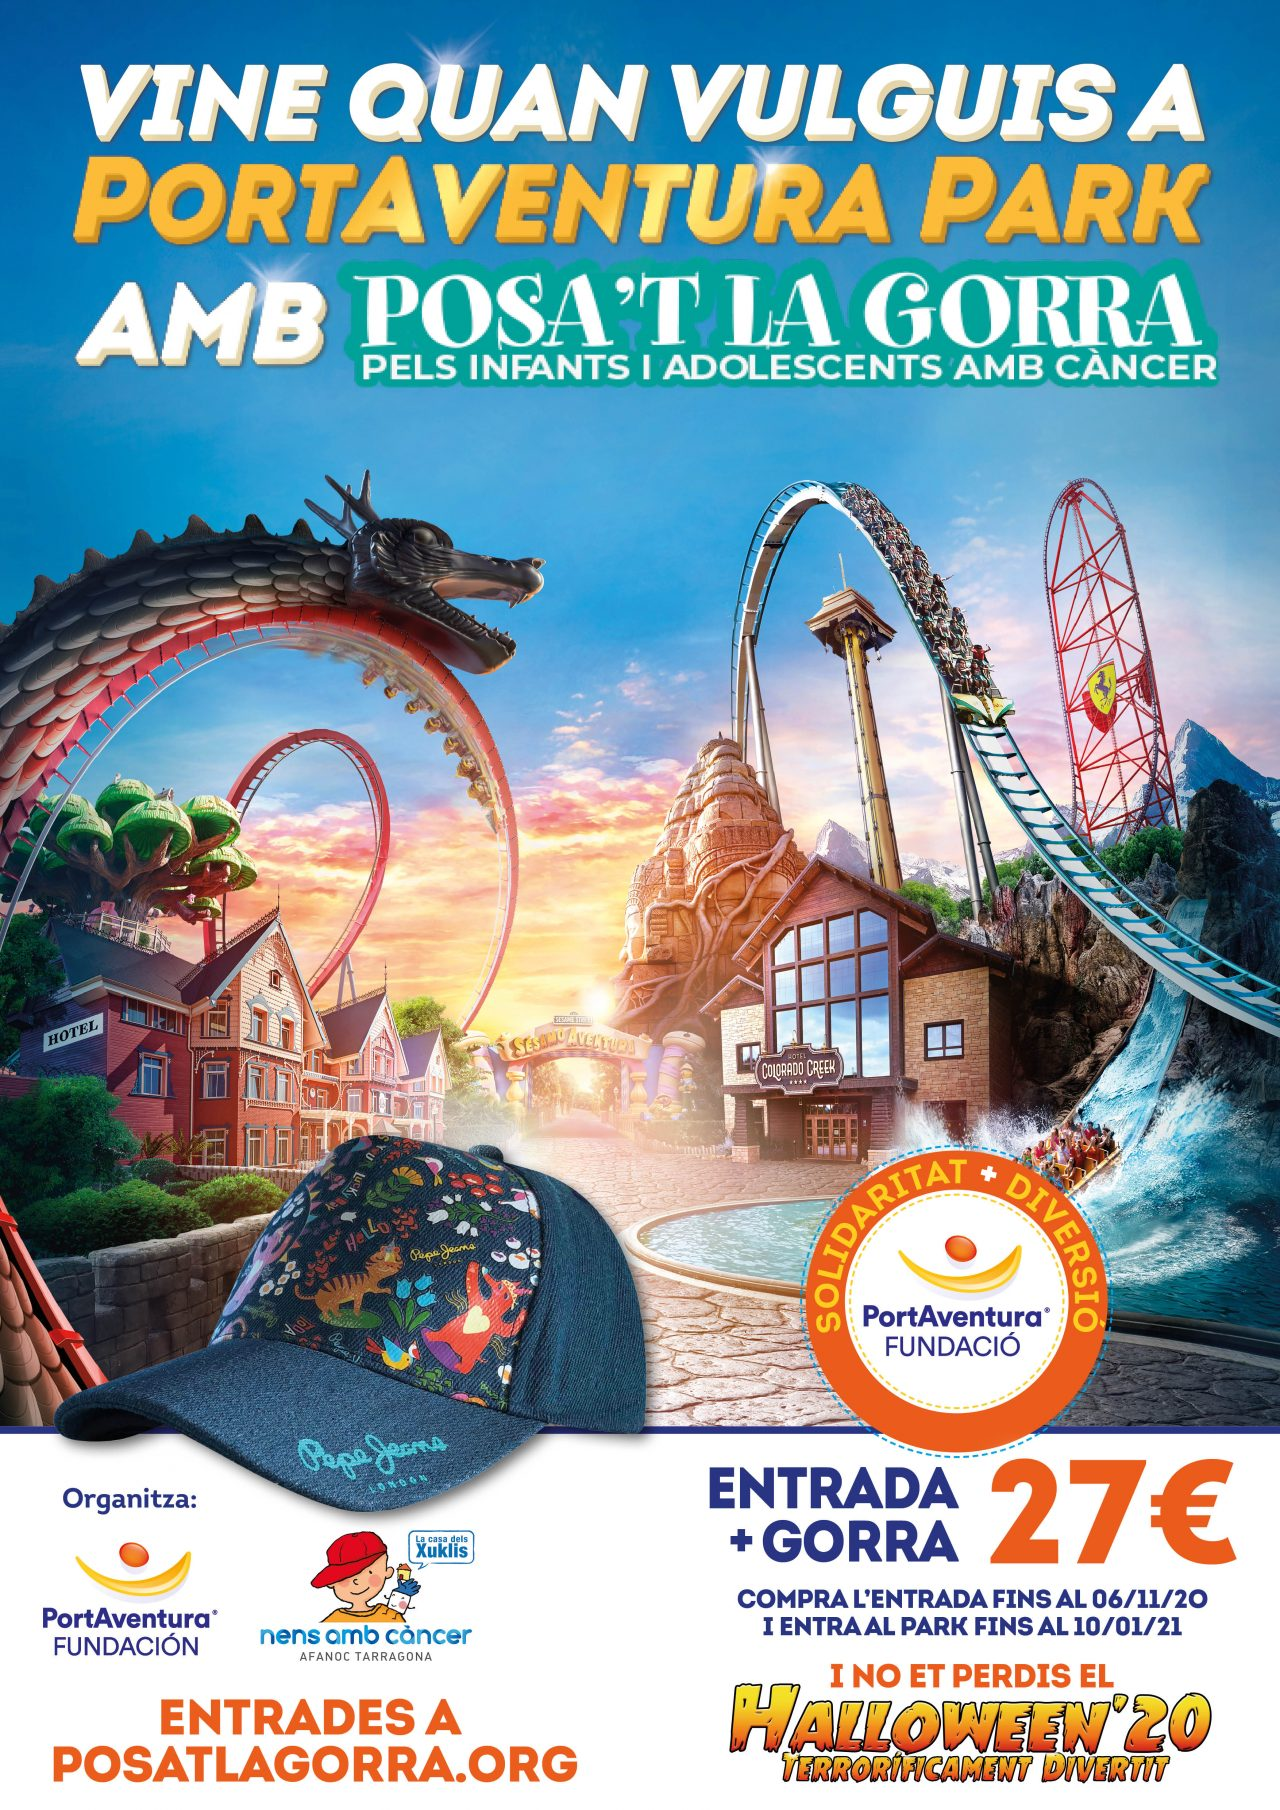 CARTELLPORTAVENTURA_POSAT-LA-GORRA_2020_-1280x1810.jpg